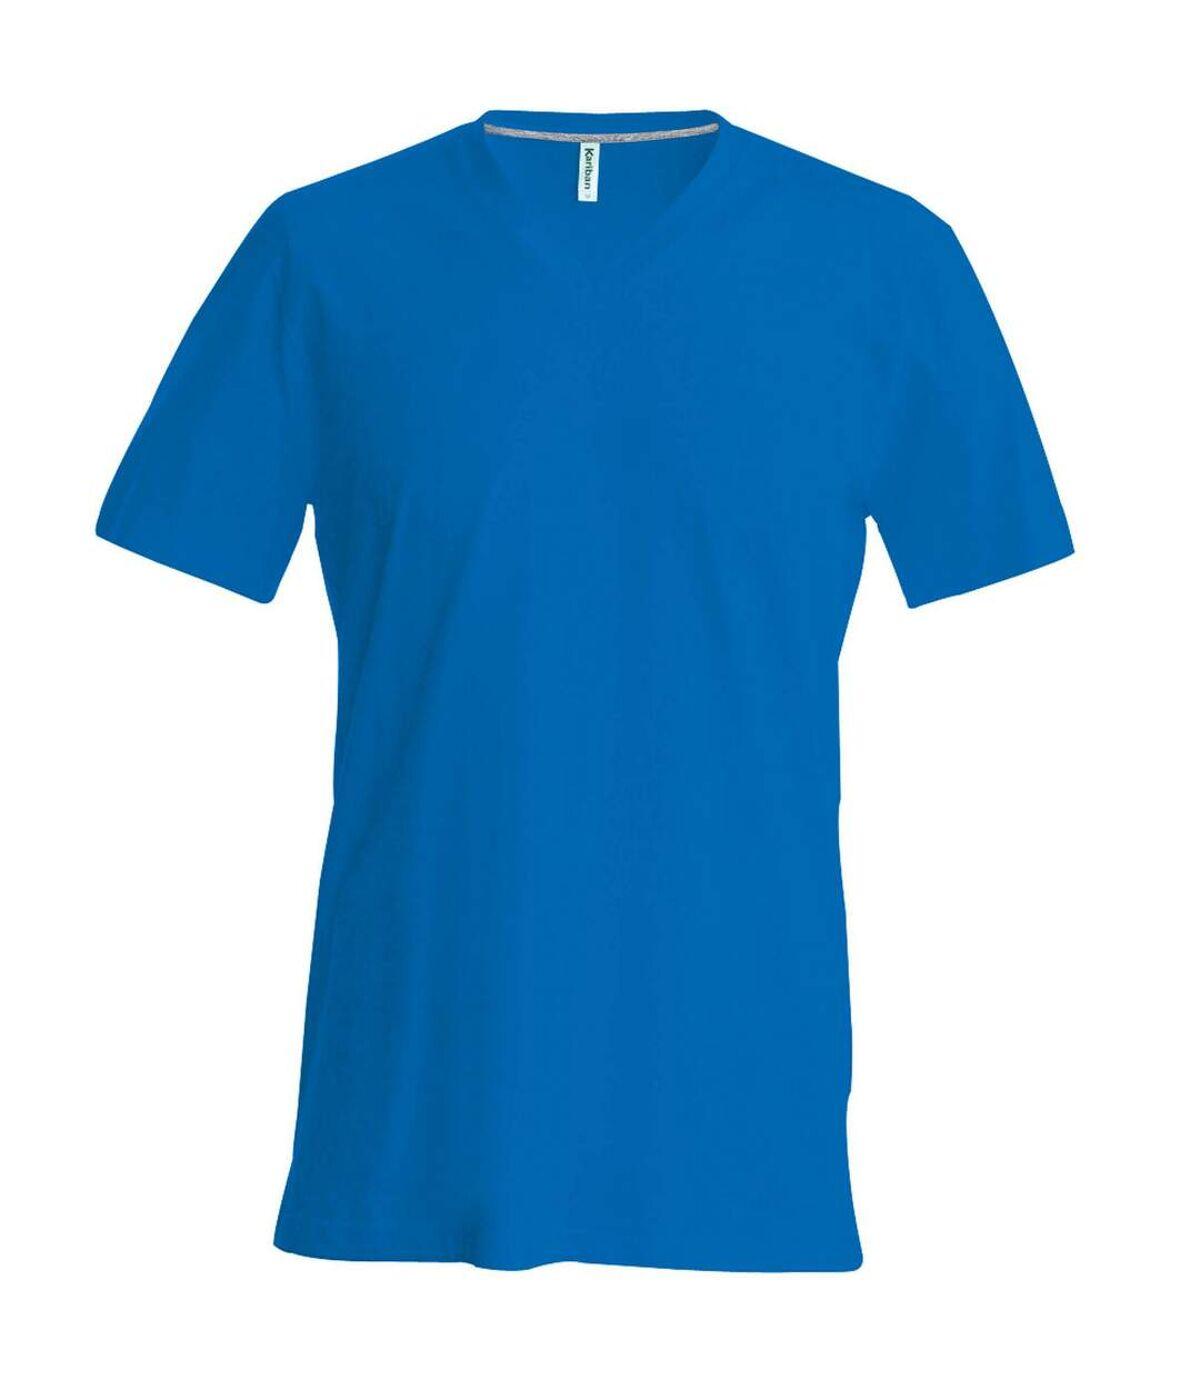 Kariban Mens Short Sleeve V Neck Slim Fit T-Shirt (Royal Blue) - UTRW707